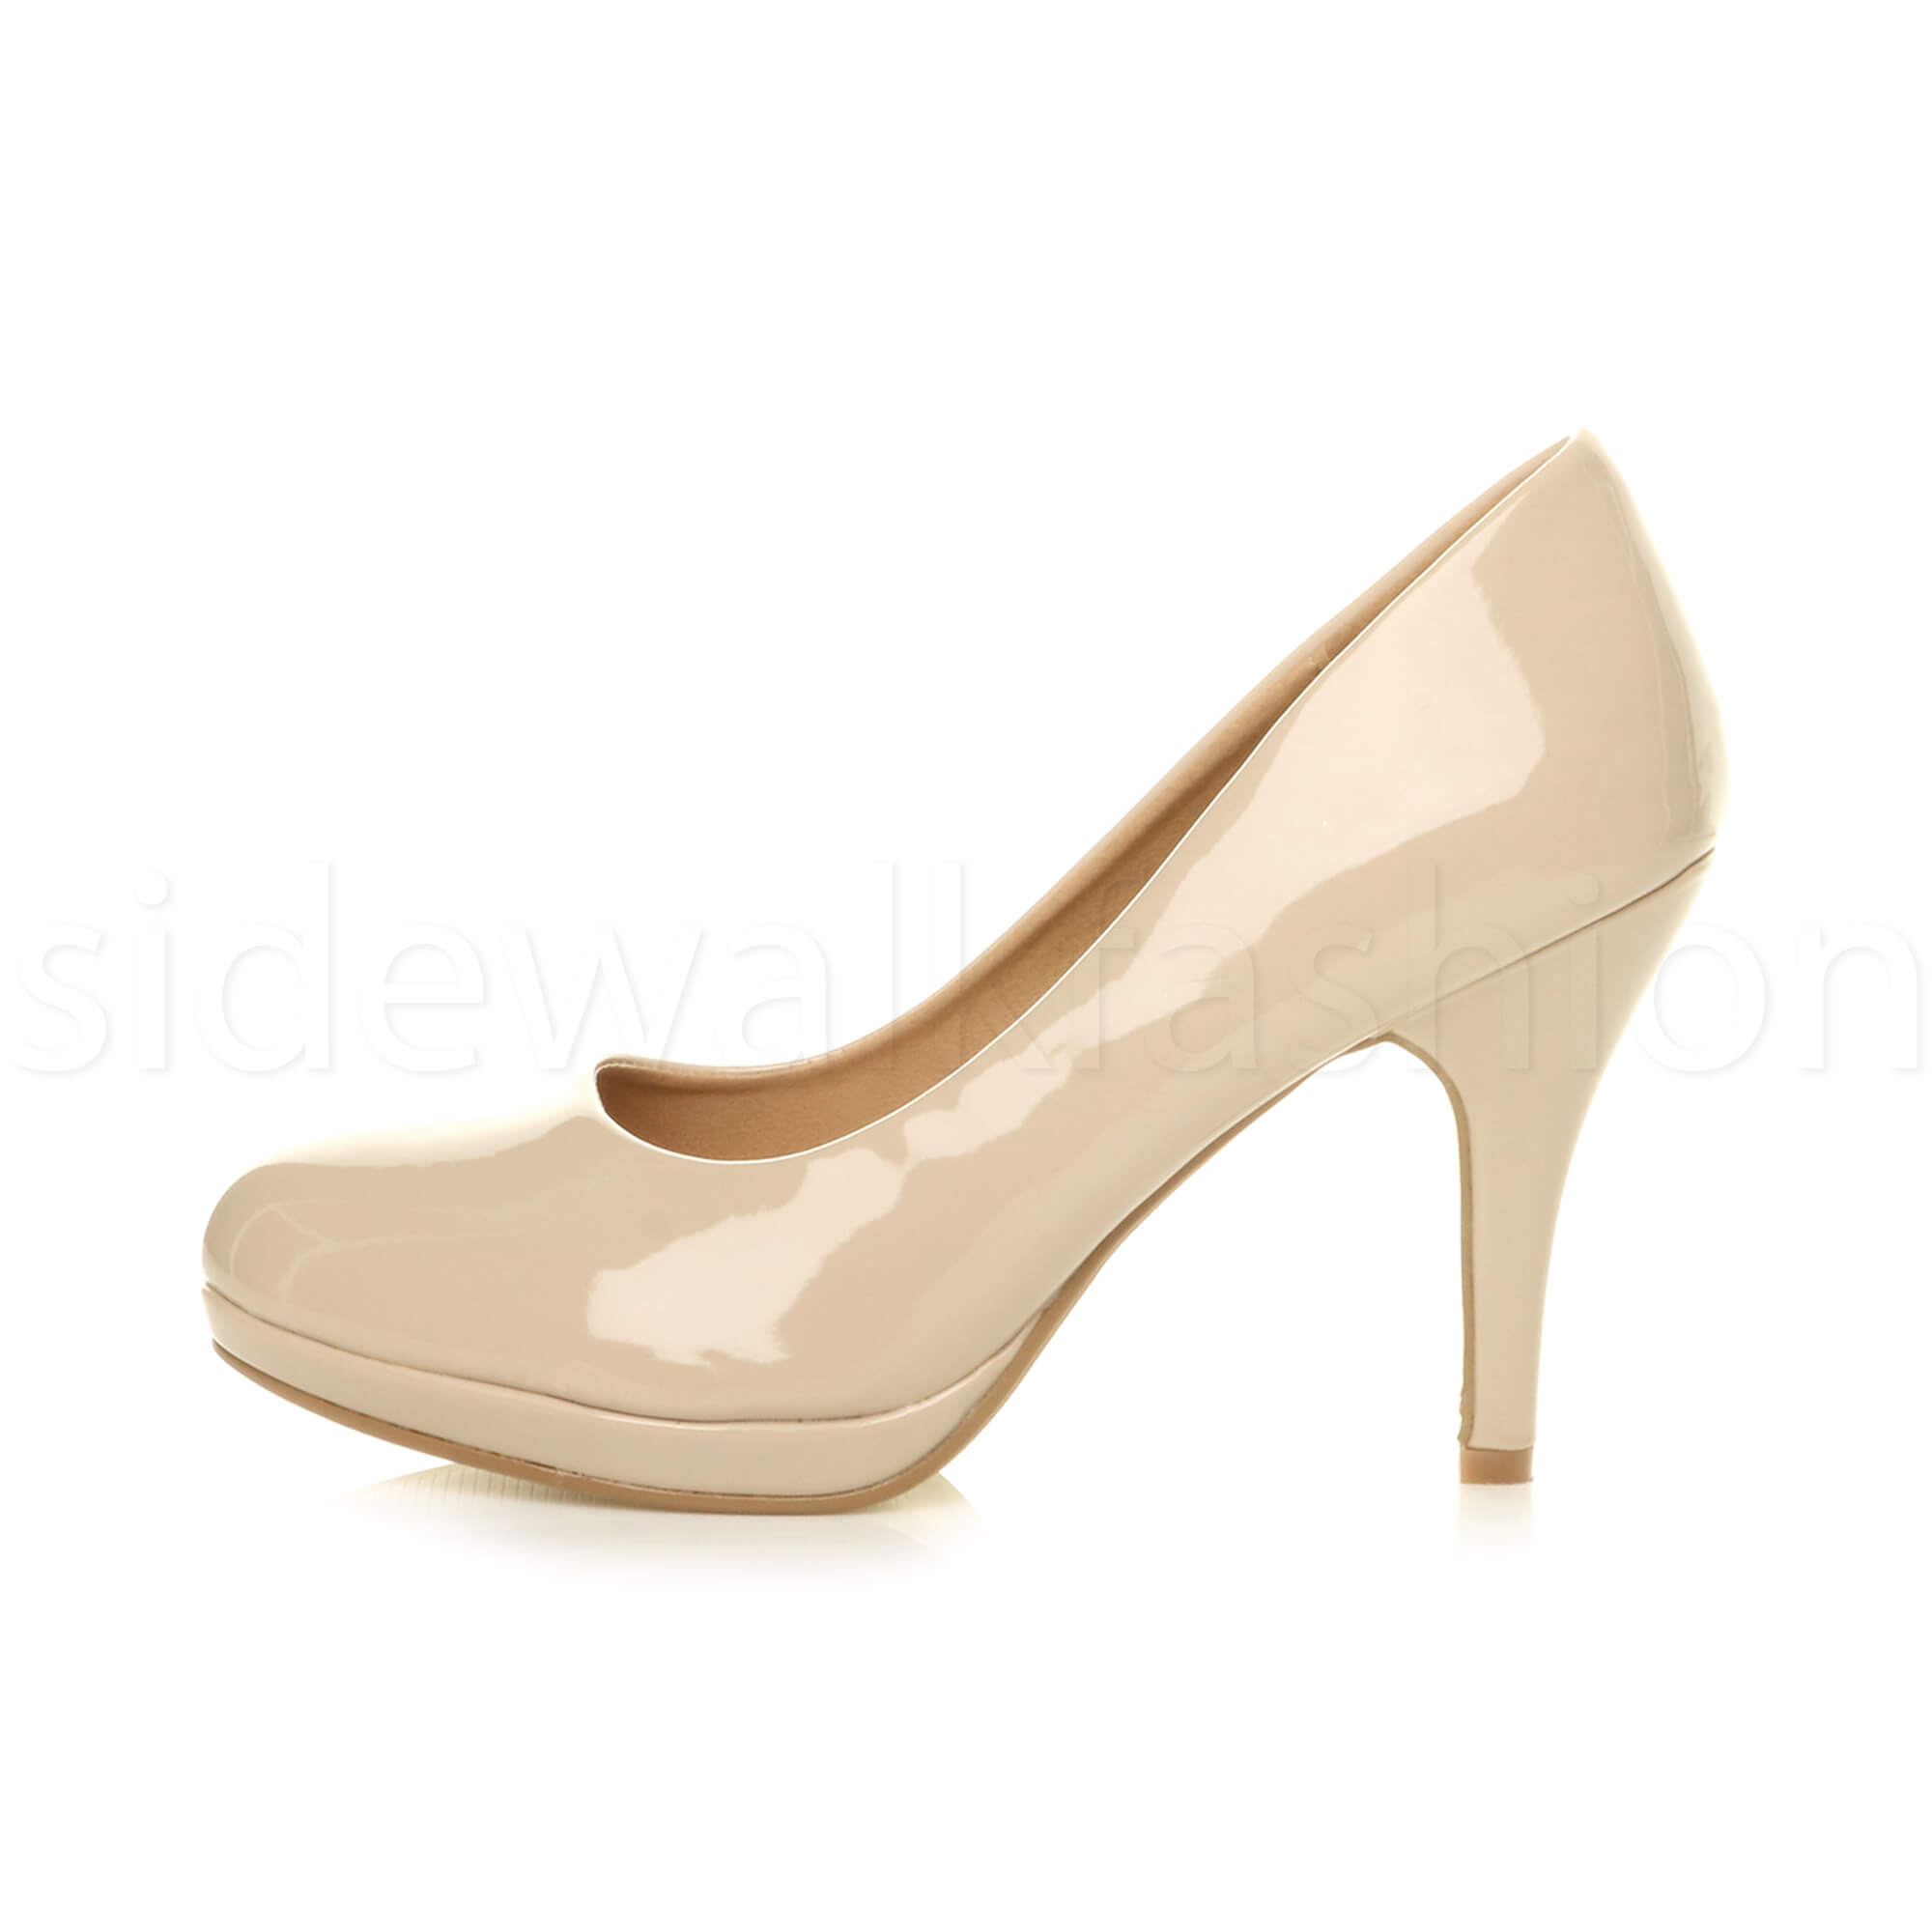 Womens-ladies-high-mid-heel-platform-wedding-evening-bridesmaid-court-shoes-size thumbnail 122